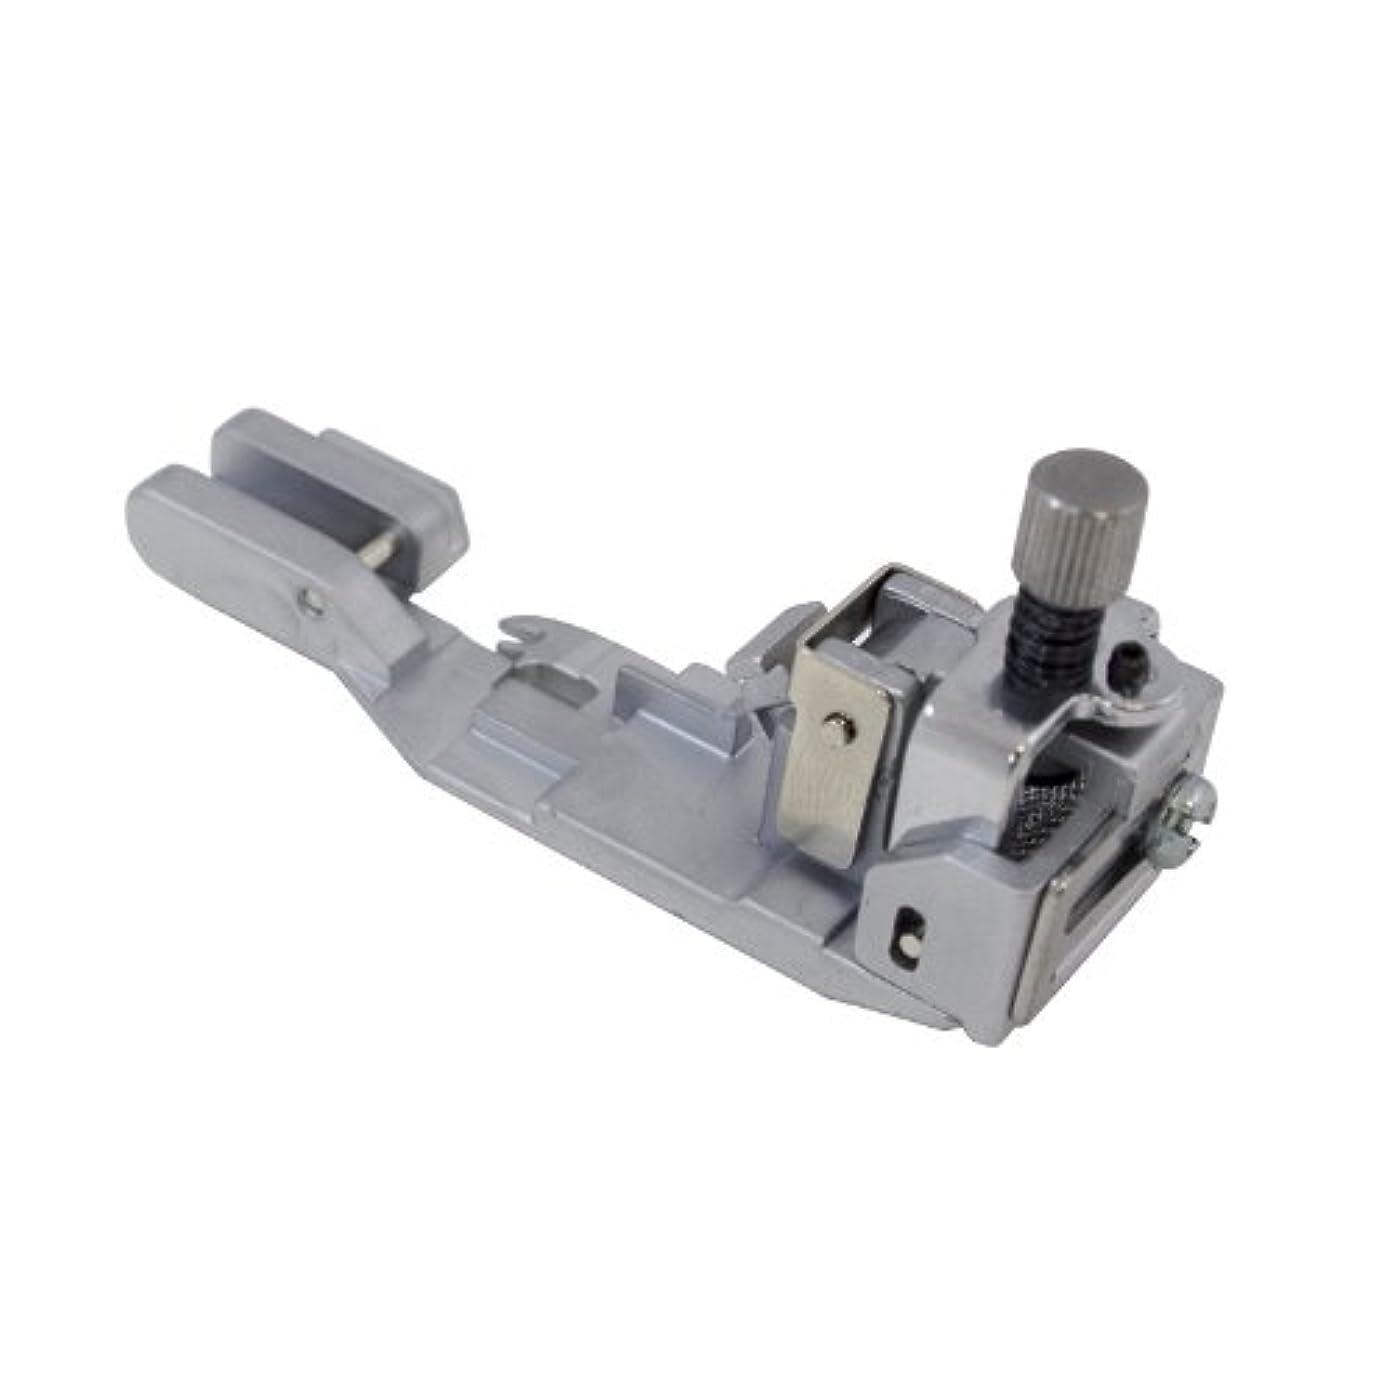 Juki Elasticator Presser Foot for MO-1000 and MO-2000 Sergers